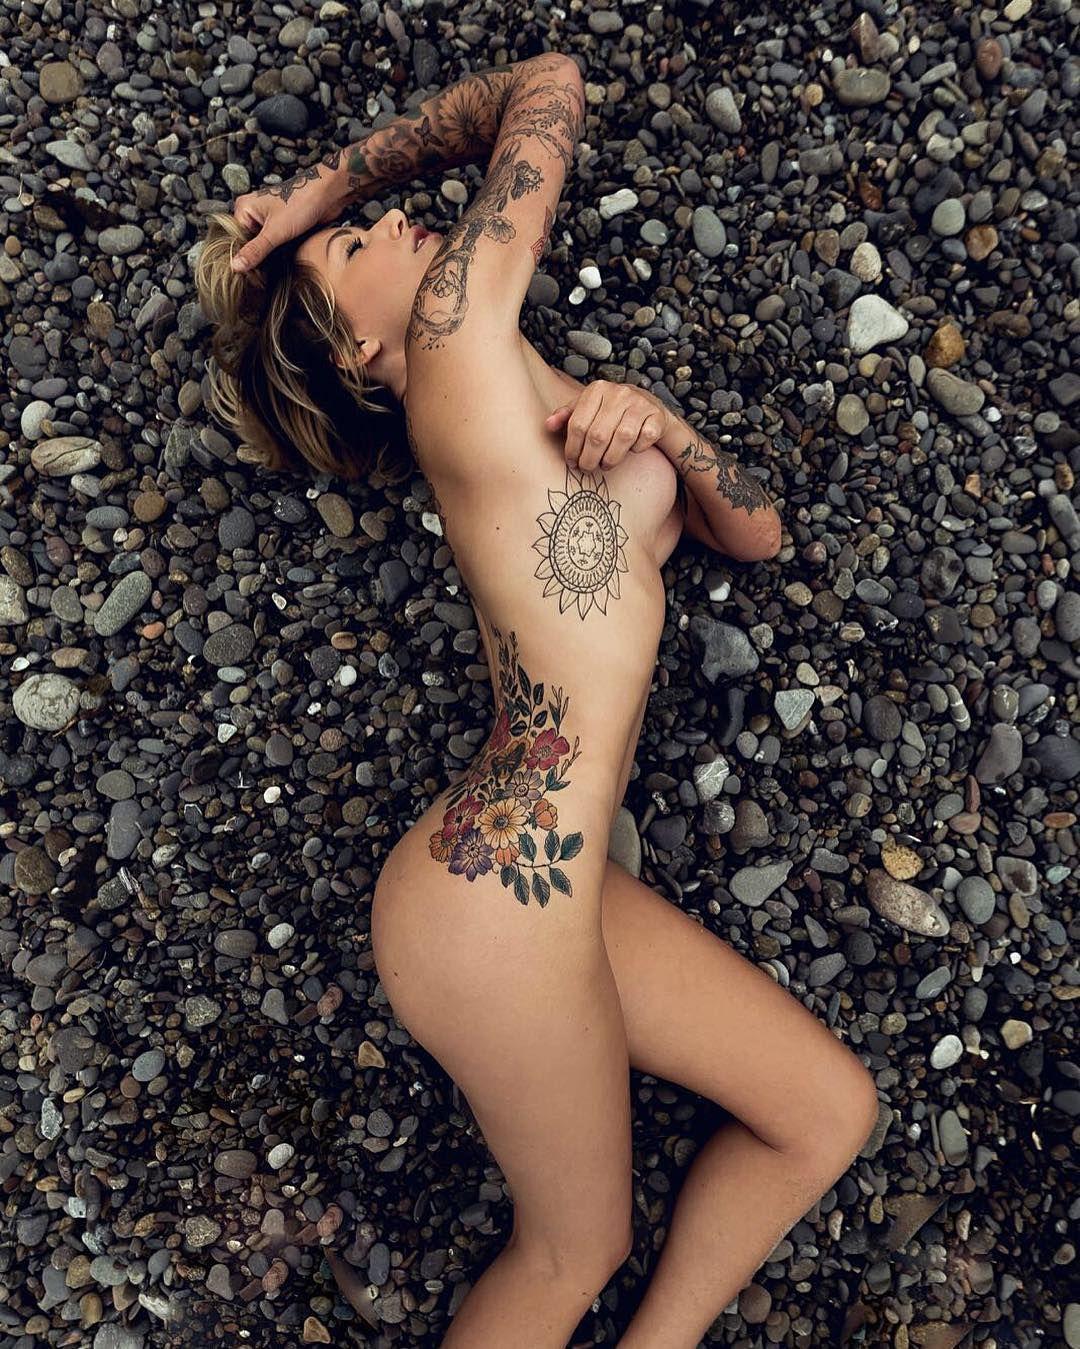 Sideboobs Tina Louise nudes (87 foto and video), Ass, Cleavage, Selfie, cleavage 2015